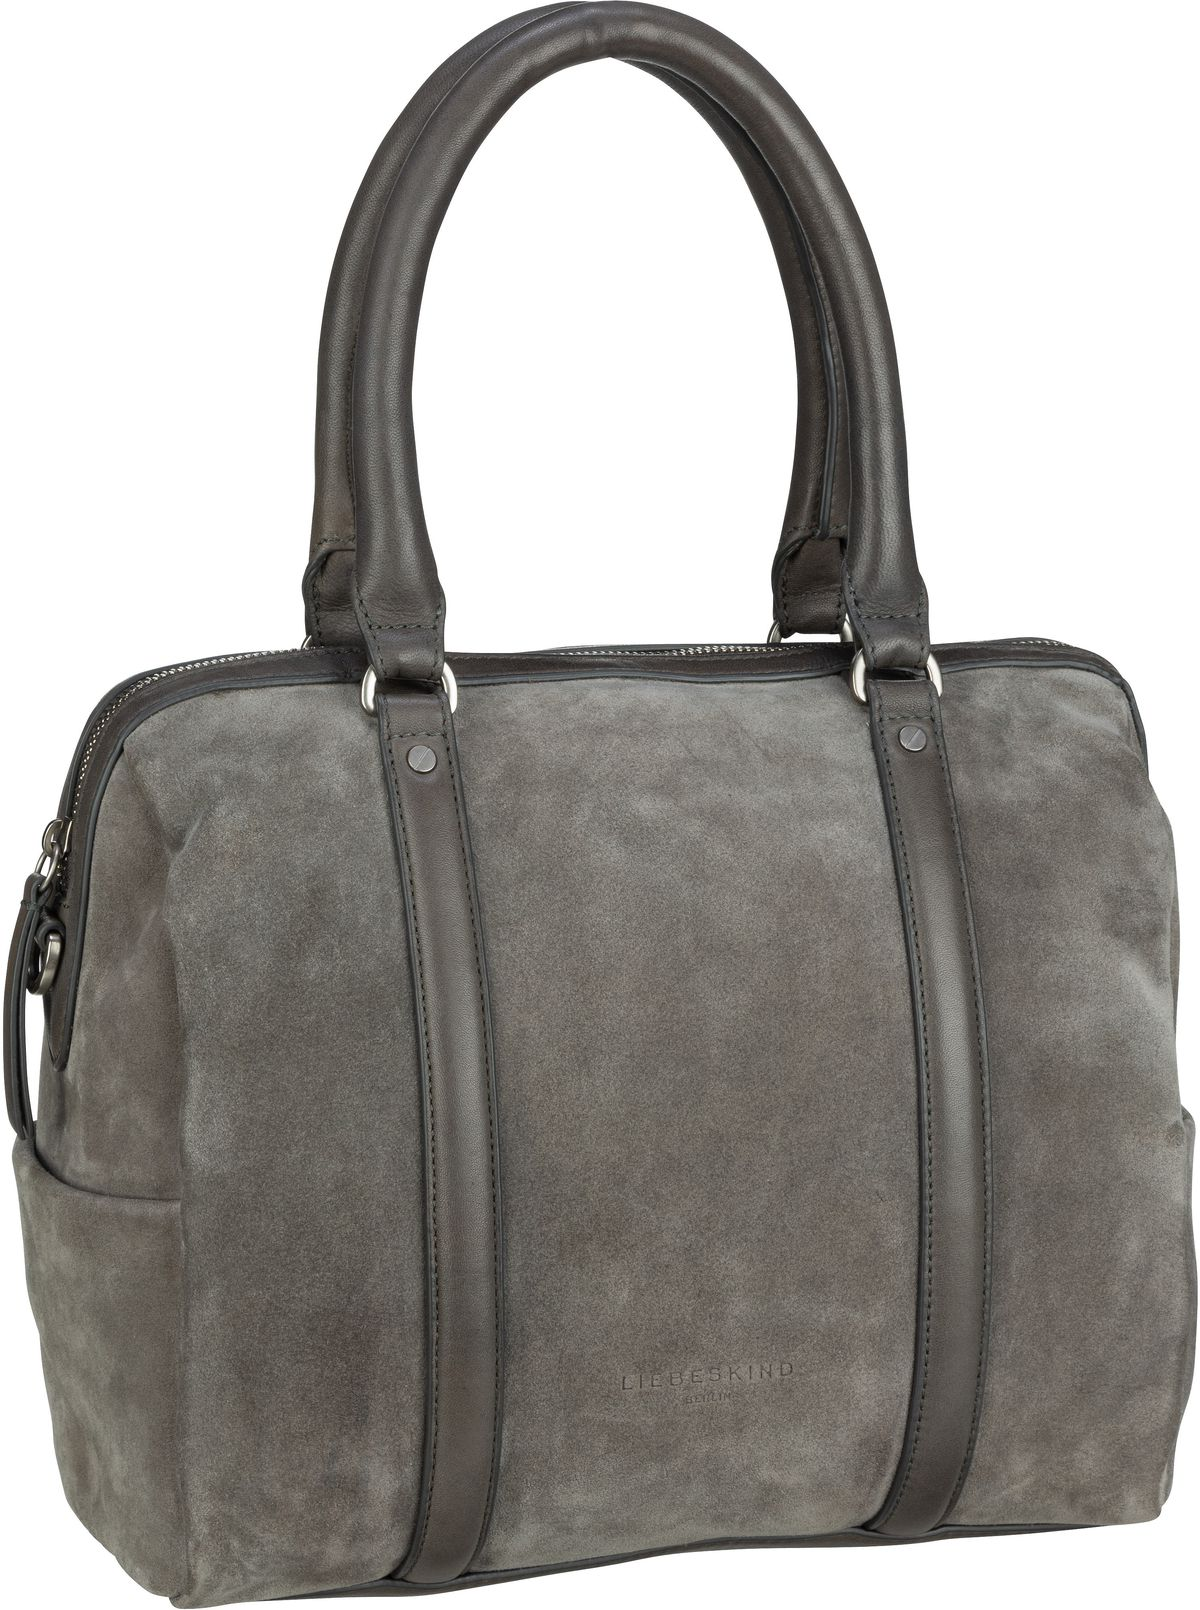 Berlin Handtasche Oak Bowling Bag M Suede Gun Grey